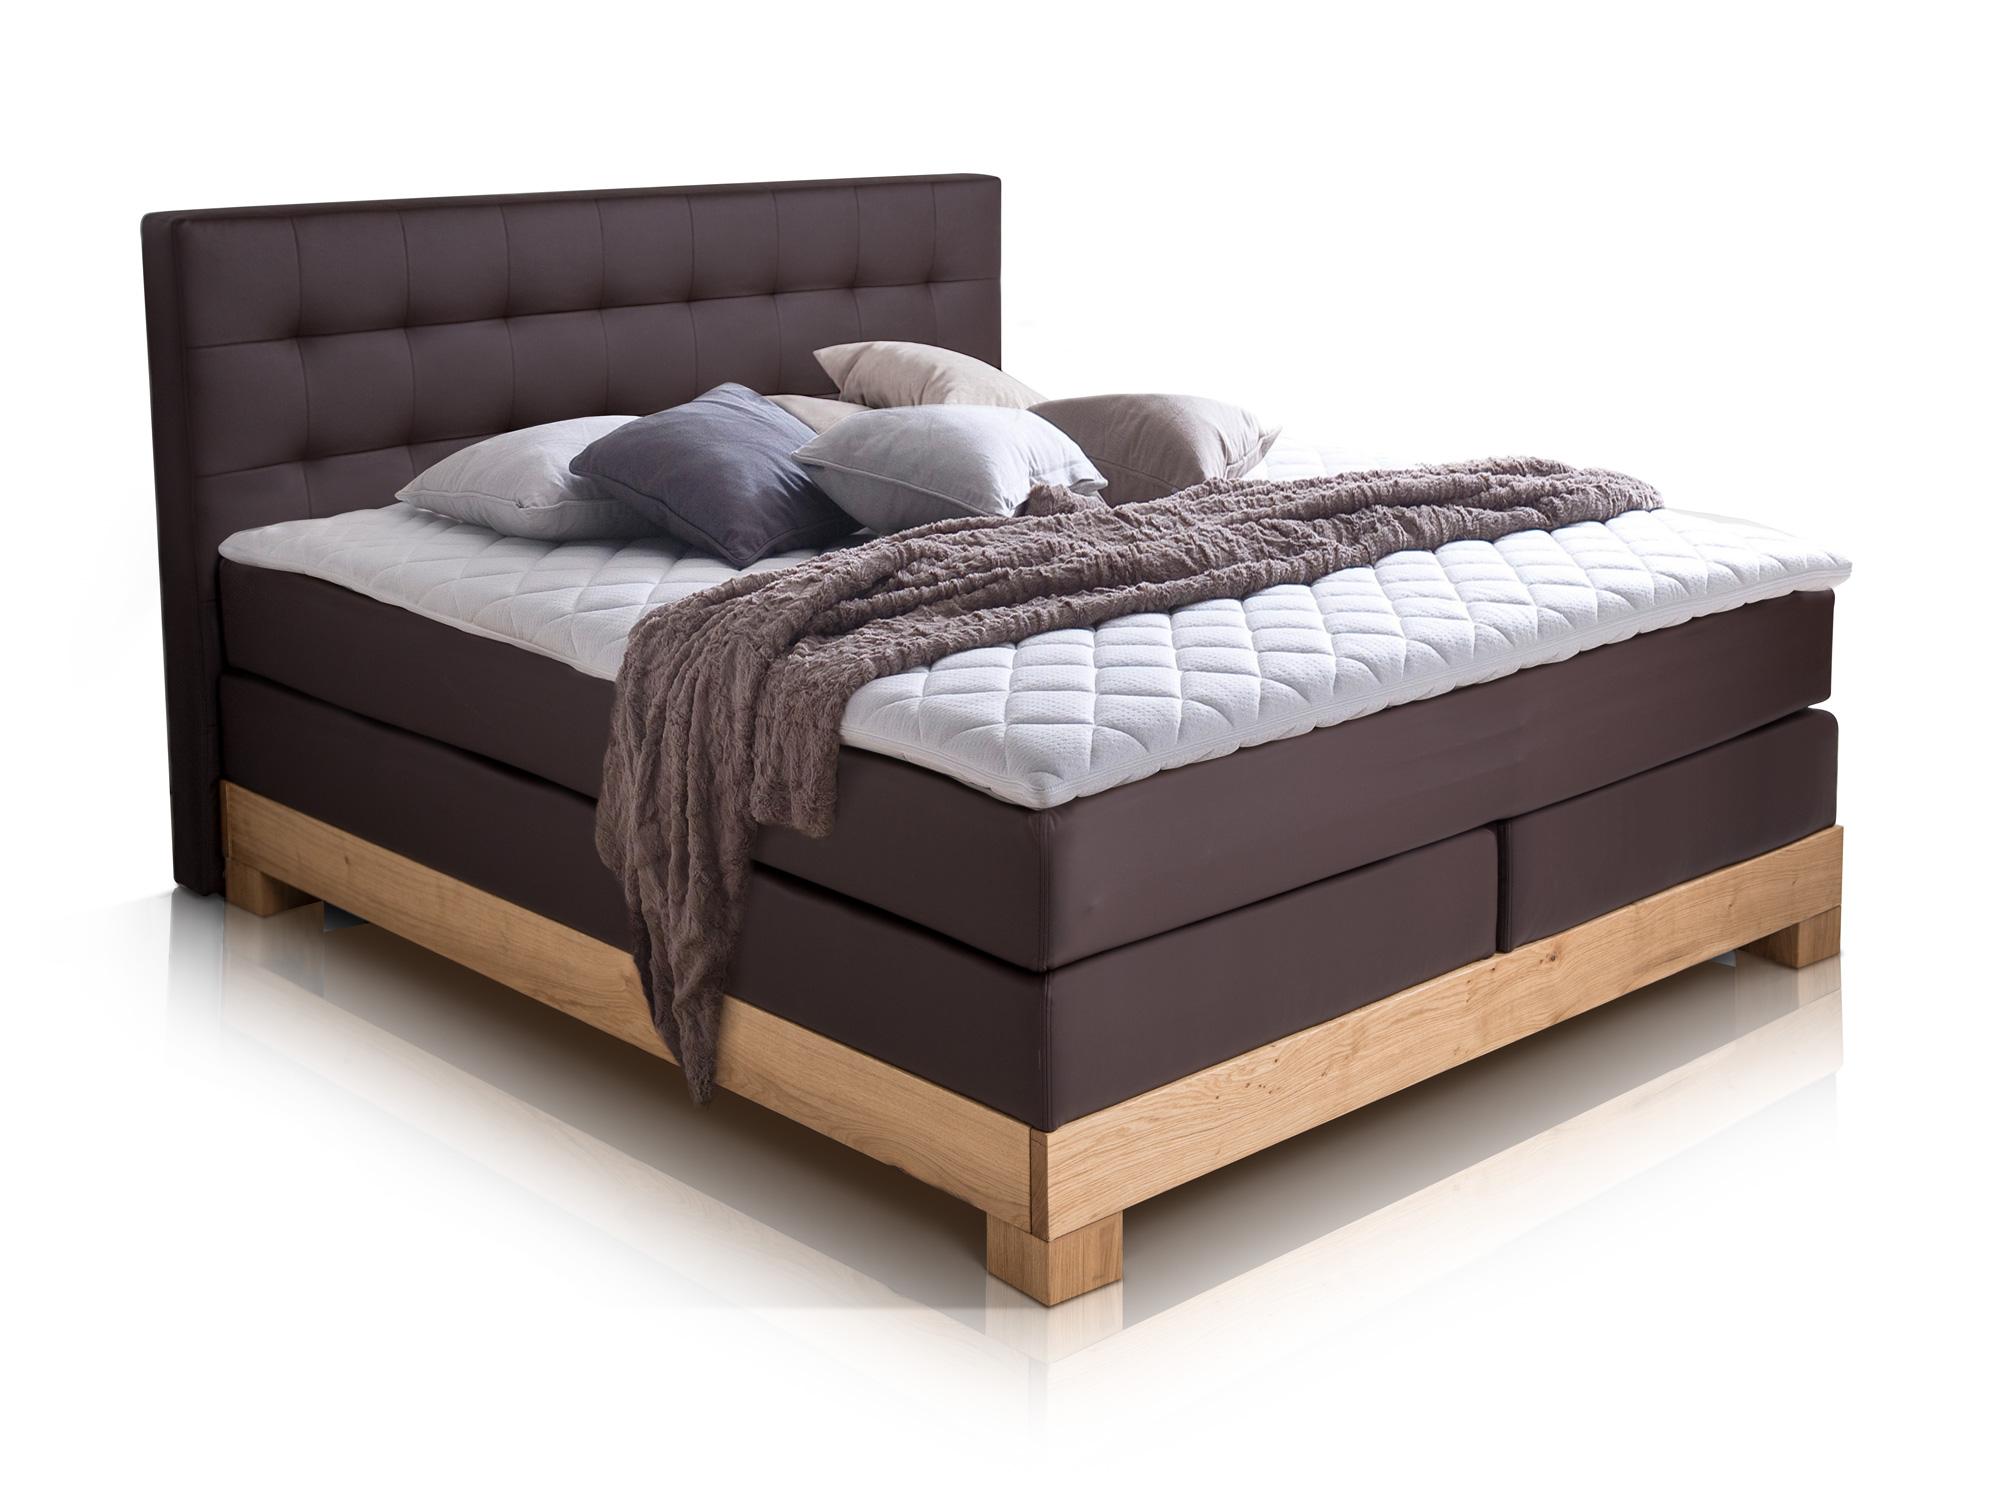 arche boxspringbett mit massivholzrahmen 160 x 200 cm braun buche h rtegrad 2. Black Bedroom Furniture Sets. Home Design Ideas